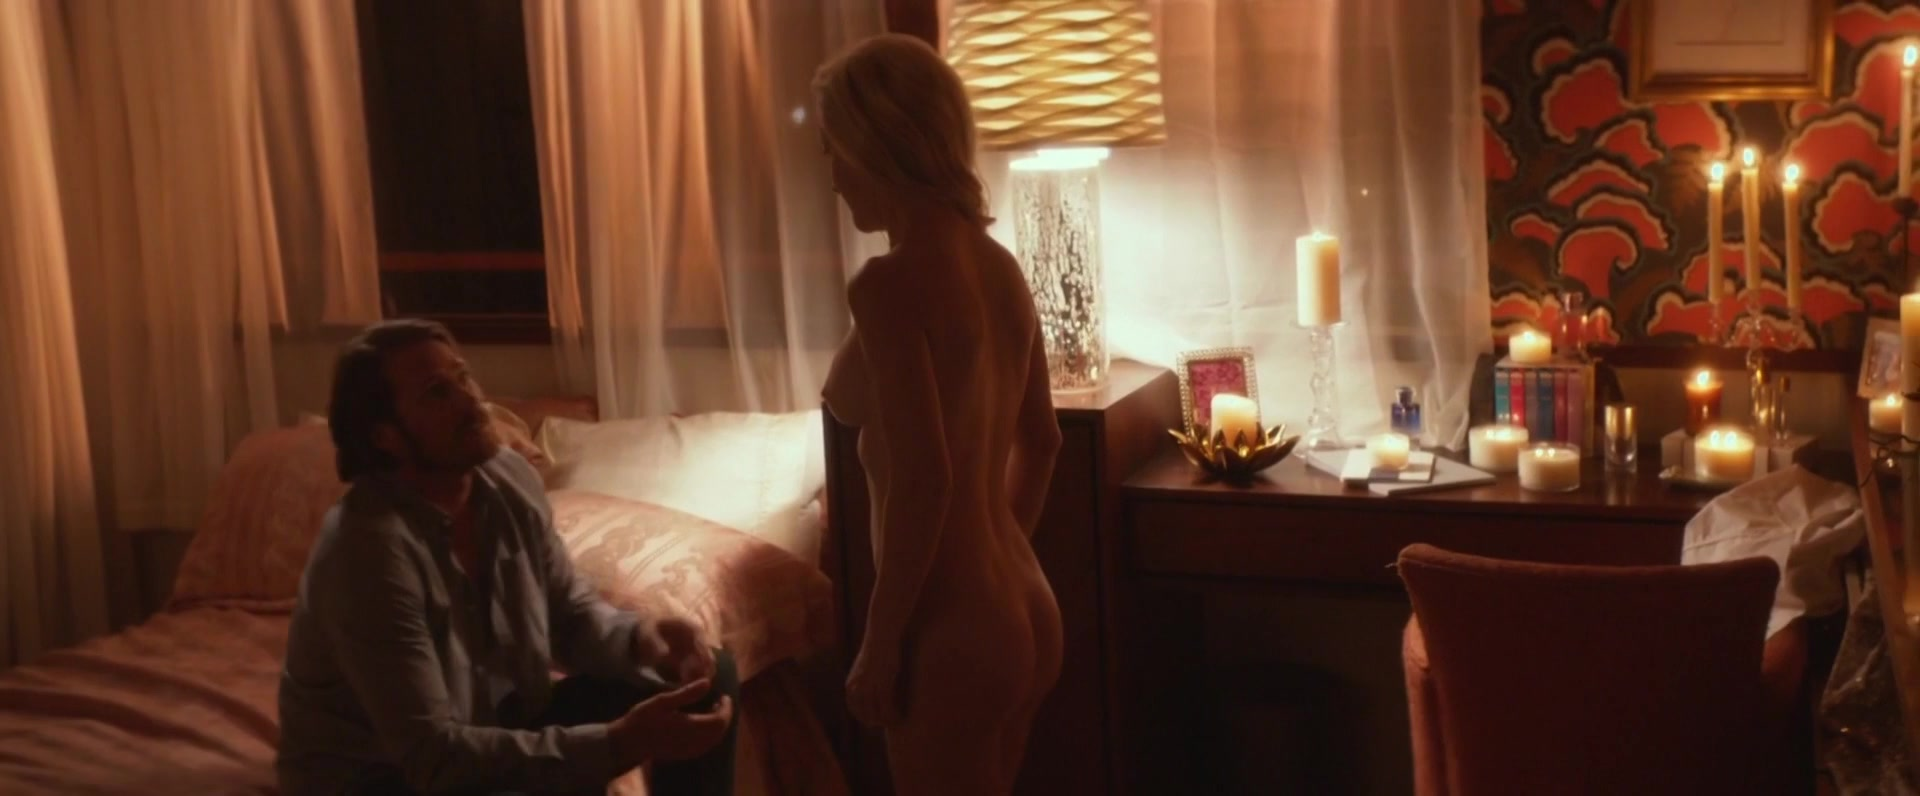 Angela Kinsey Nude Scene angela kinsey nude - half magic (2018) video » best sexy